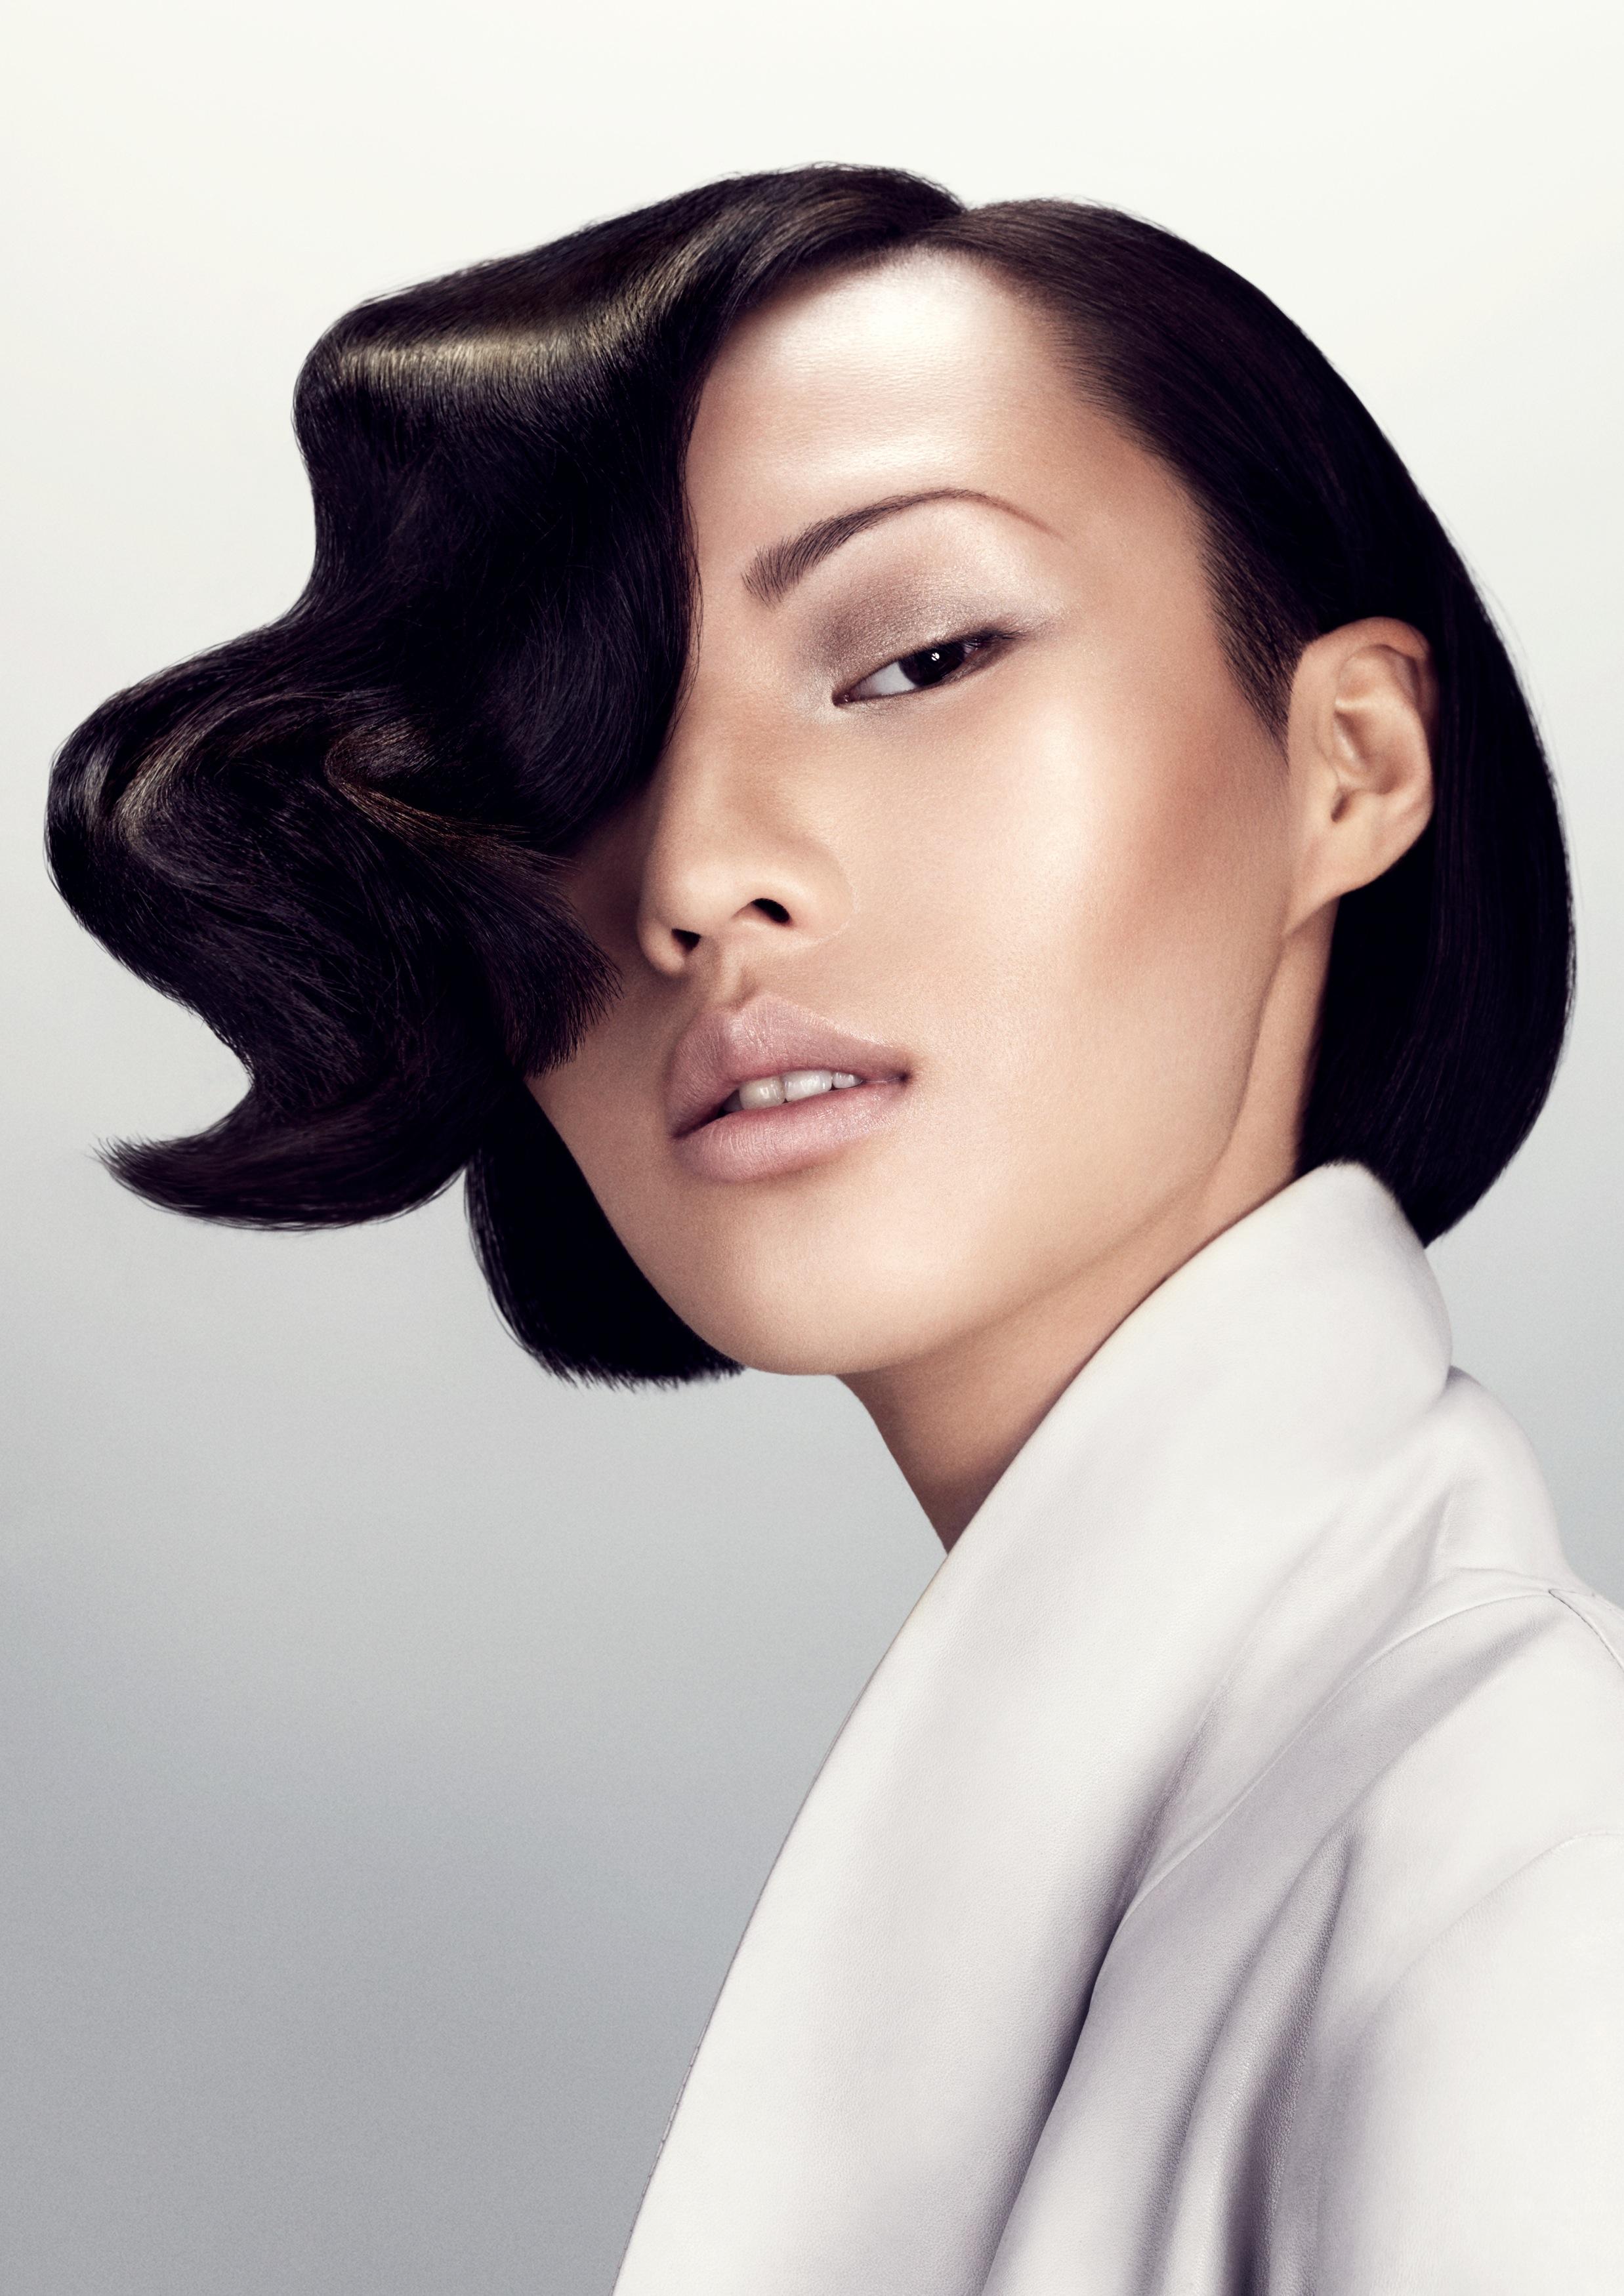 hairstyle by Scott Sloan 8